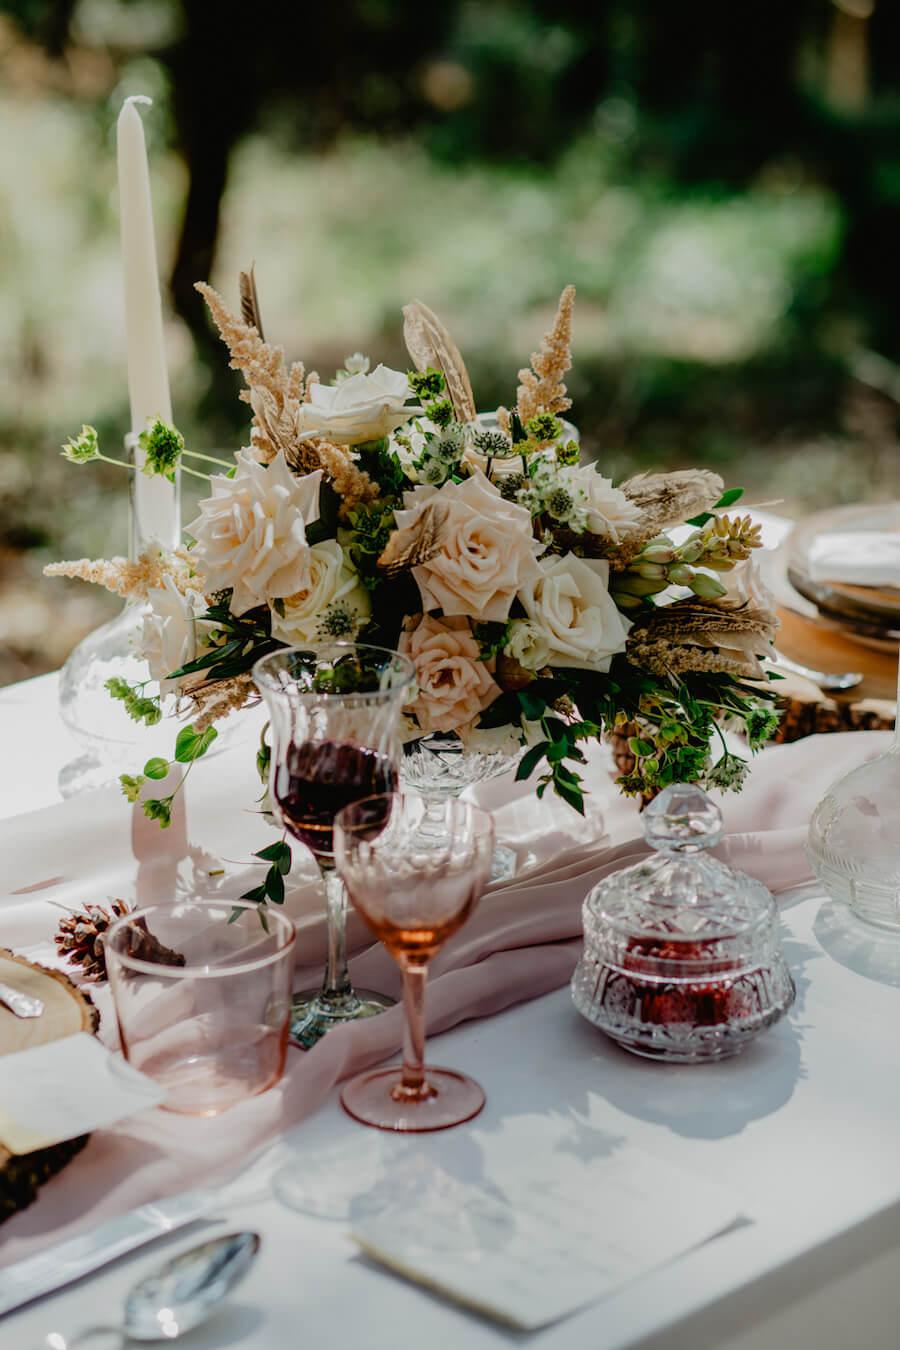 matrimonio-a-tema-stelle-in-pineta-federica-cosentino-22